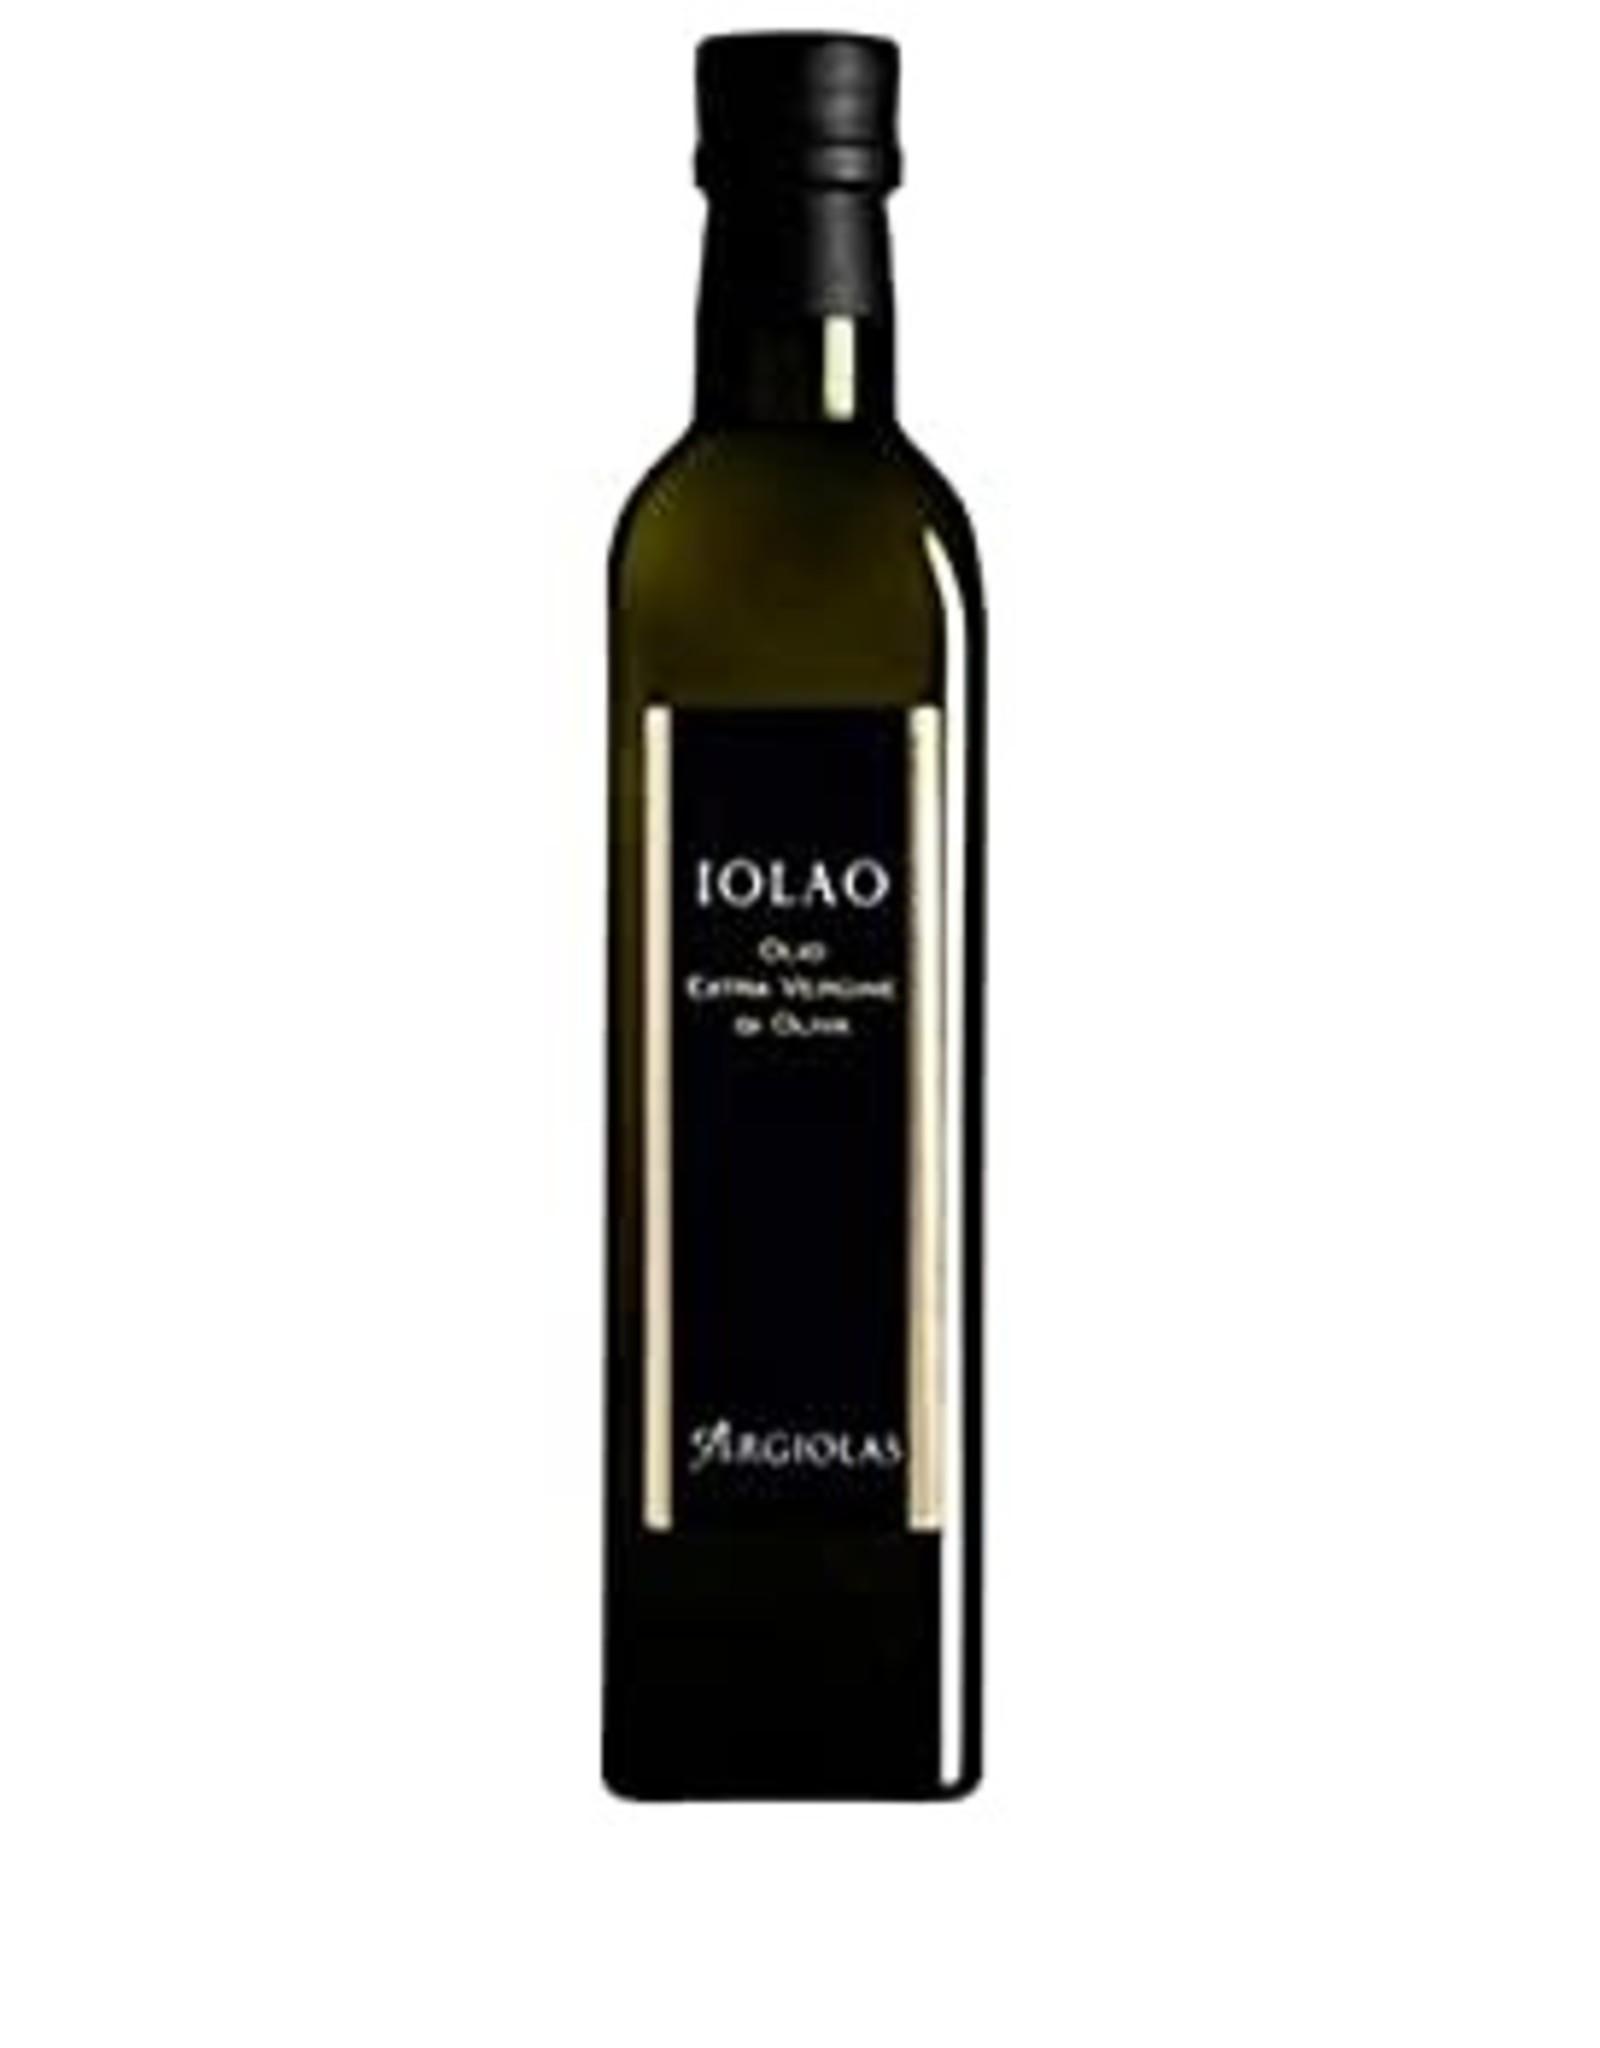 Argiolas Olive Oil 'Iolao'